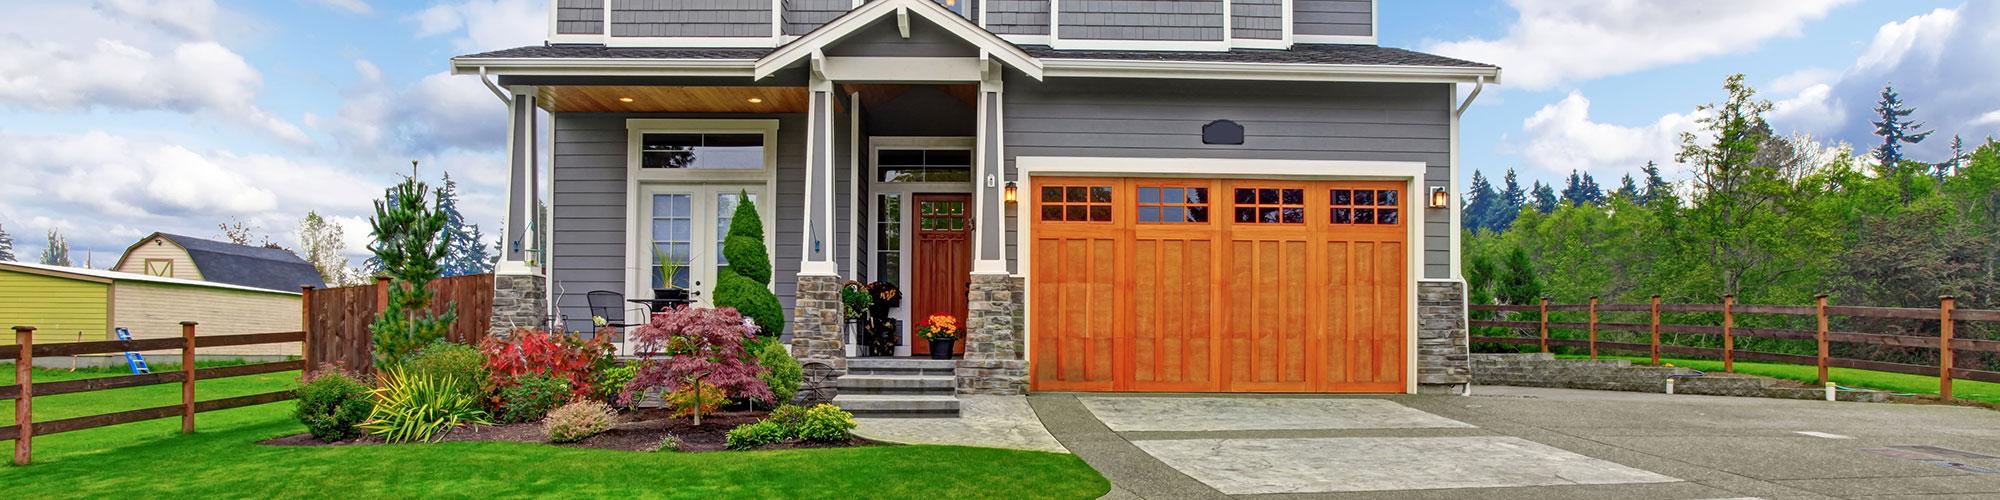 garage-door-repair-los-angeles-1 Garage Door Repair Stevenson Ranch